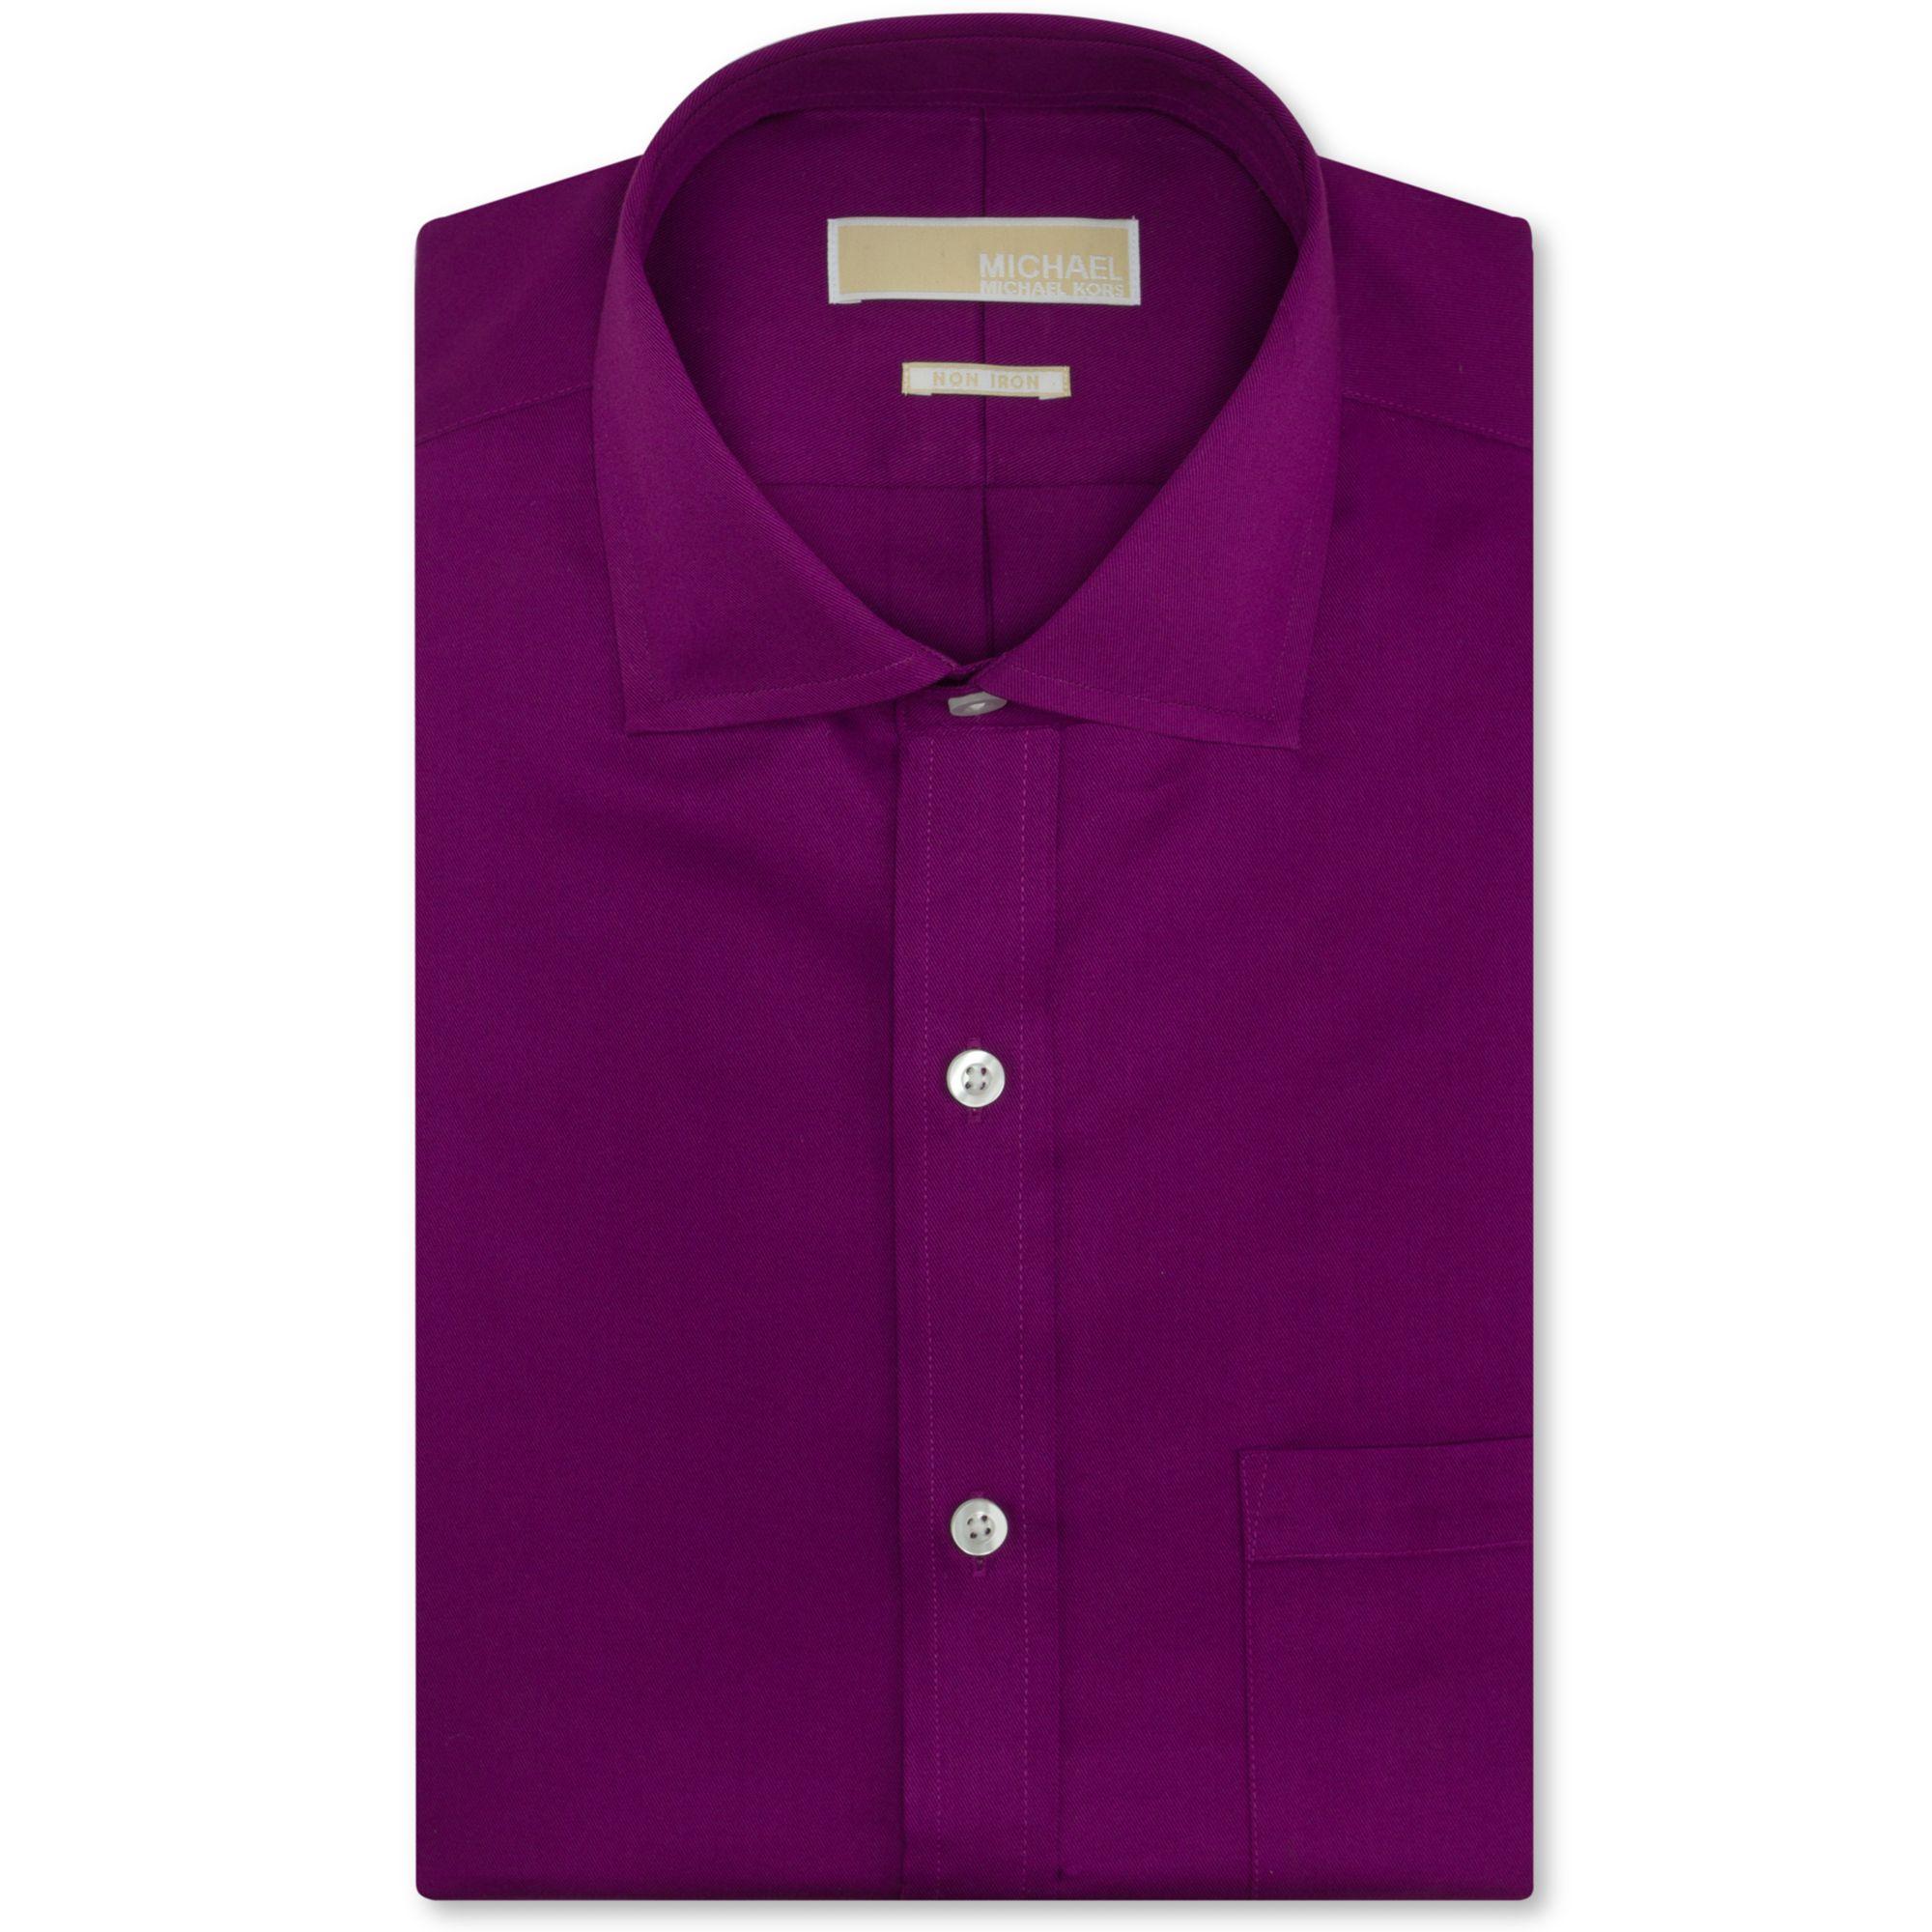 Lyst Michael Kors Michael Noniron Violet Solid Dress Shirt In